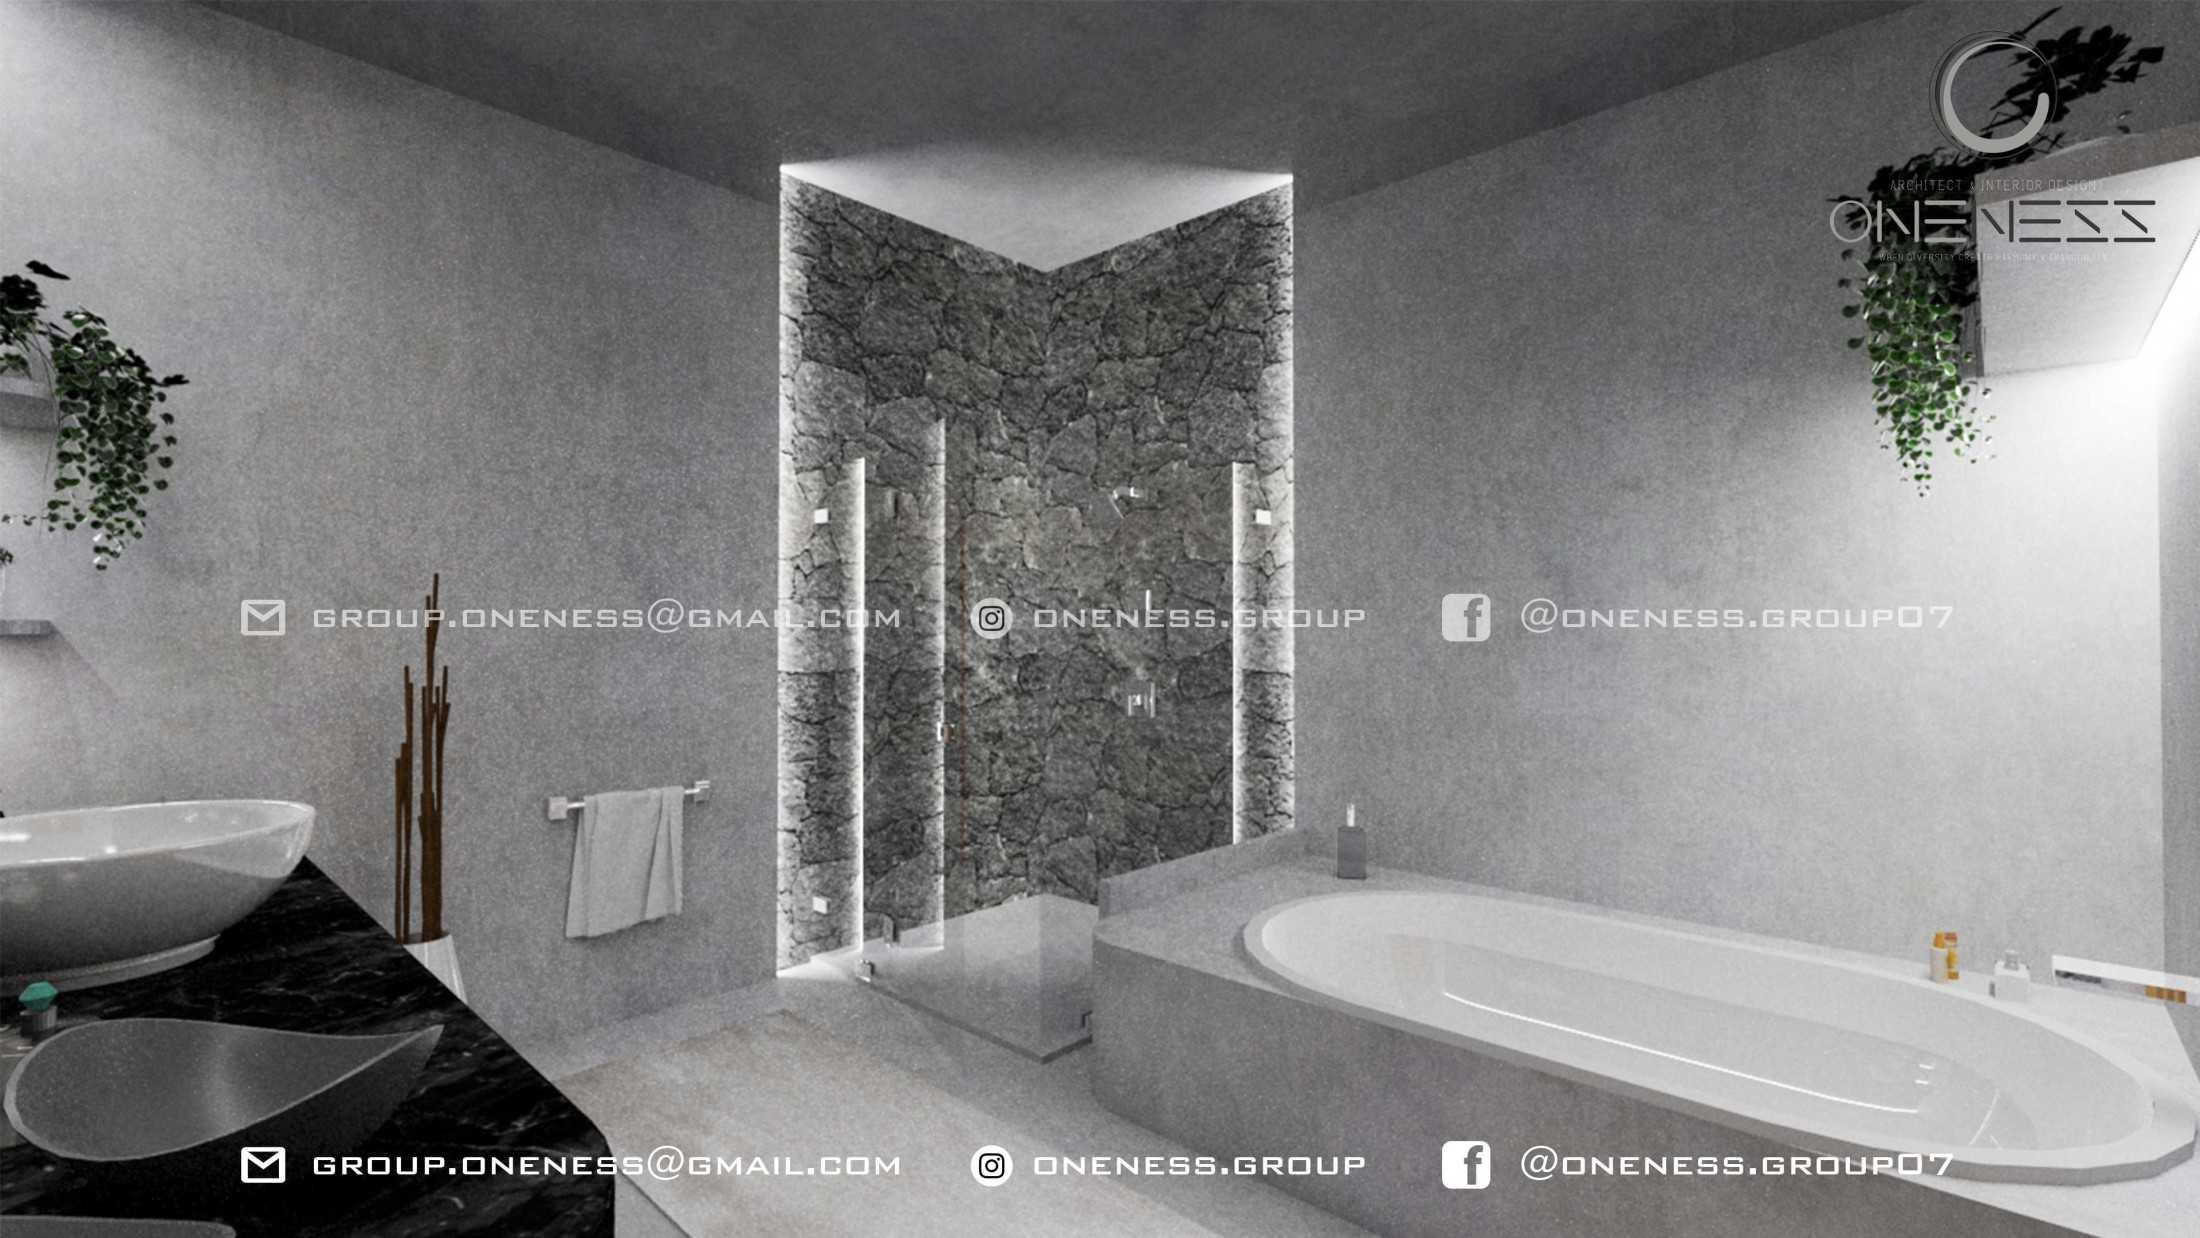 Oneness Group Villa Hijau Bali Bali, Indonesia Bali, Indonesia Toilet  98255